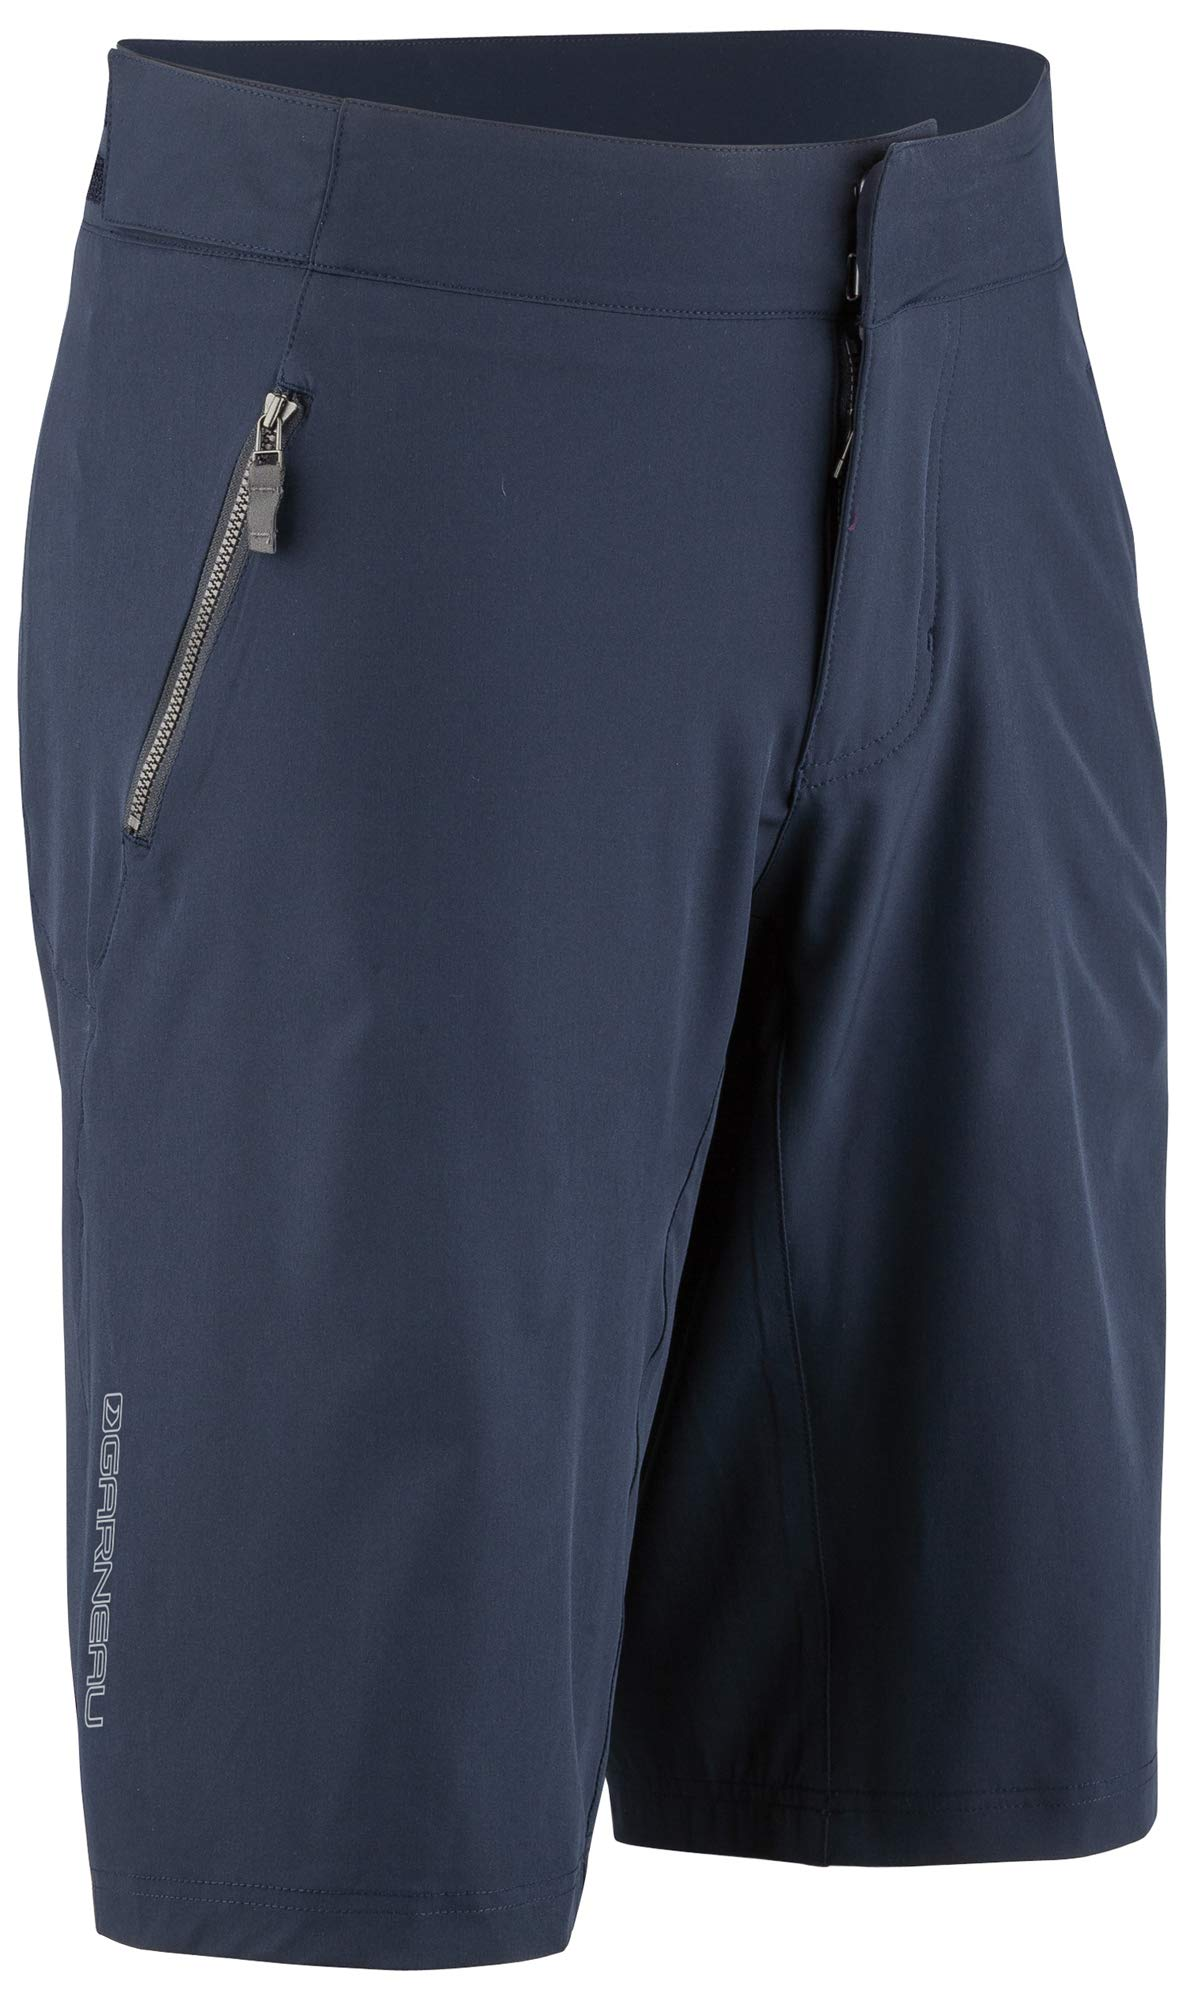 Louis Garneau Men's Leeway Bike Shorts, Dark Night, Small